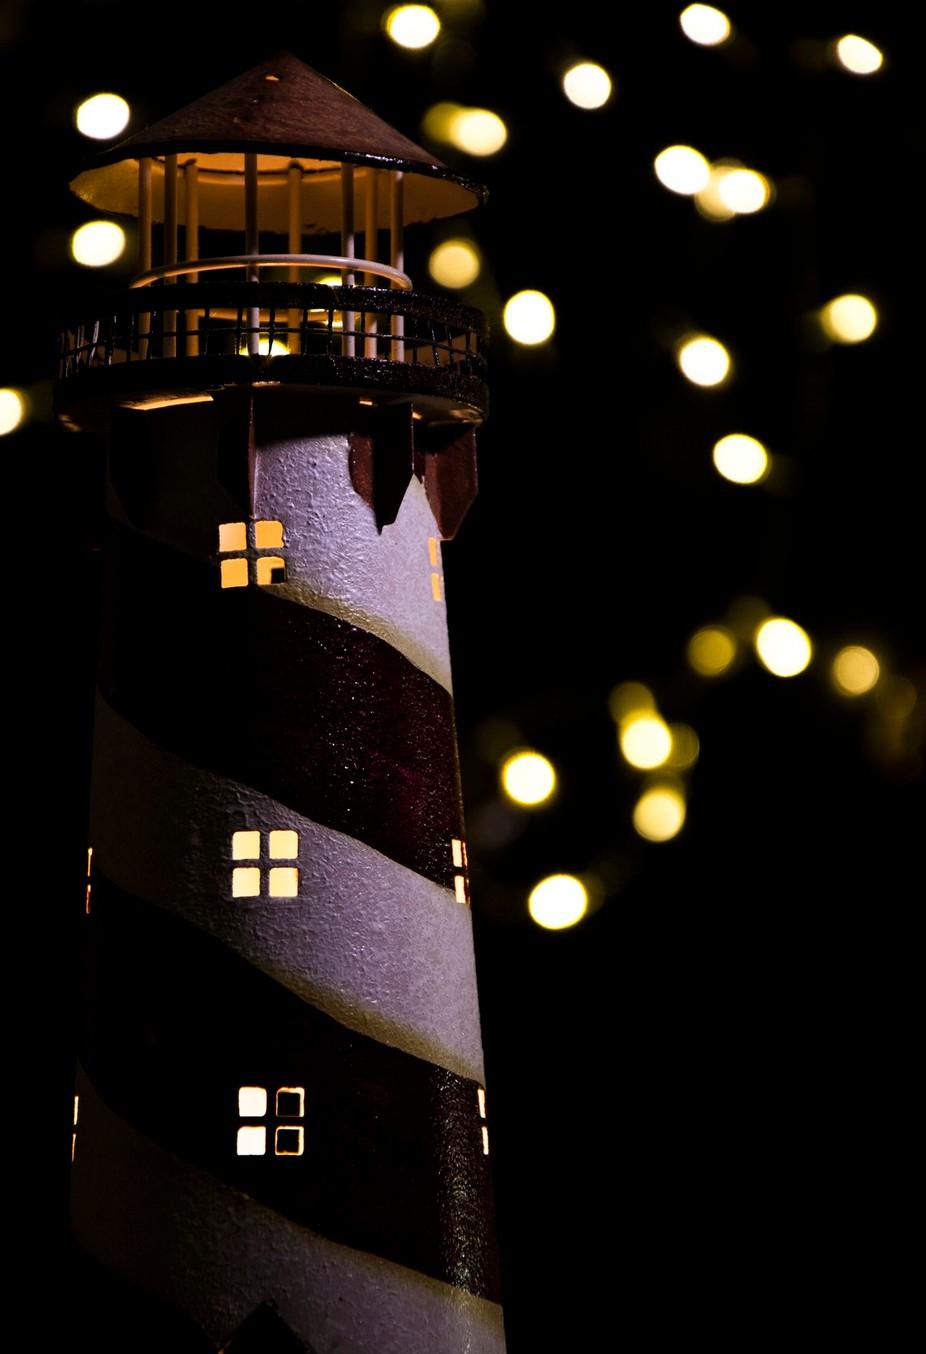 starry night at the light house by lukeperez - Night Wonders Photo Contest